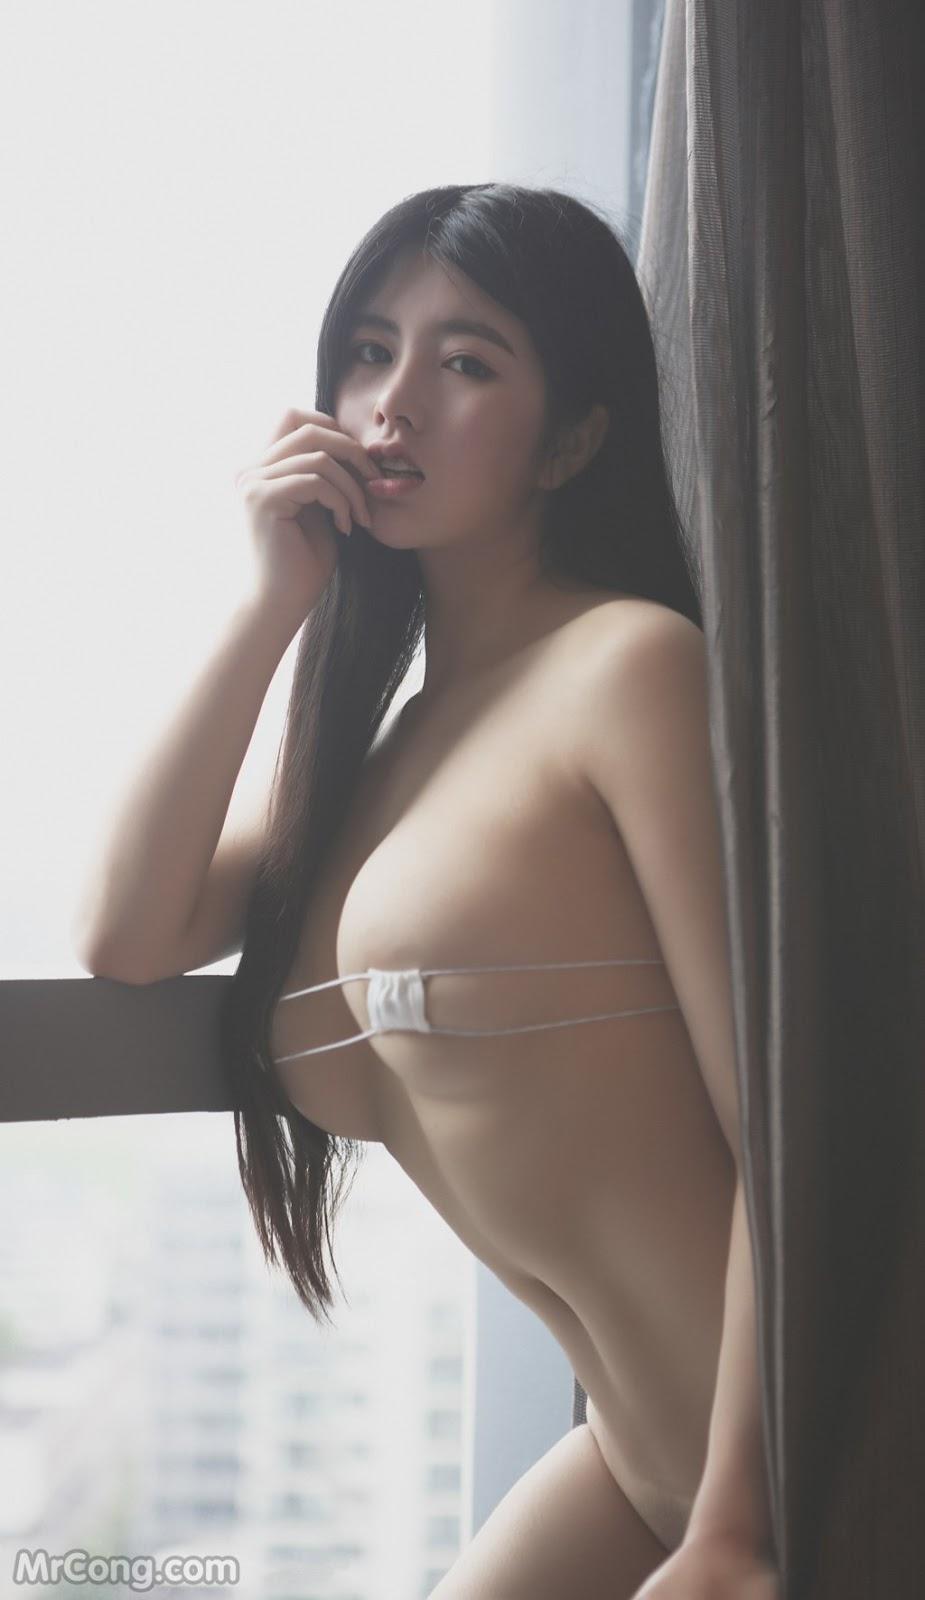 Image BoLoli-2017-06-06-Vol.066-Selena-Na-Lu-MrCong.com-011 in post BoLoli 2017-06-06 Vol.066: Người mẫu Selena (娜露) (35 ảnh)